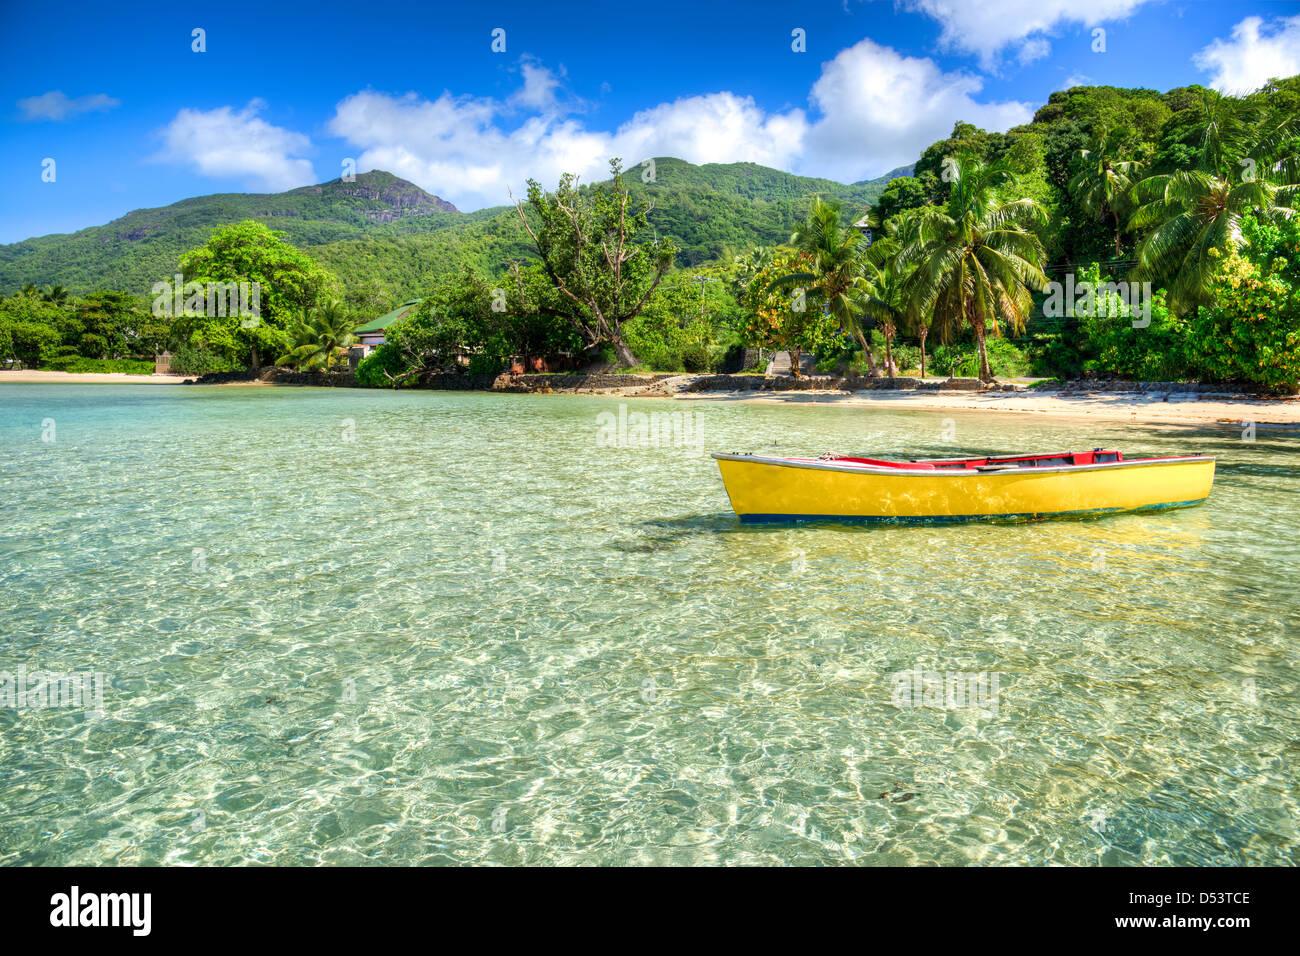 Port Launay beach, Mahe island, Seychelles Stock Photo